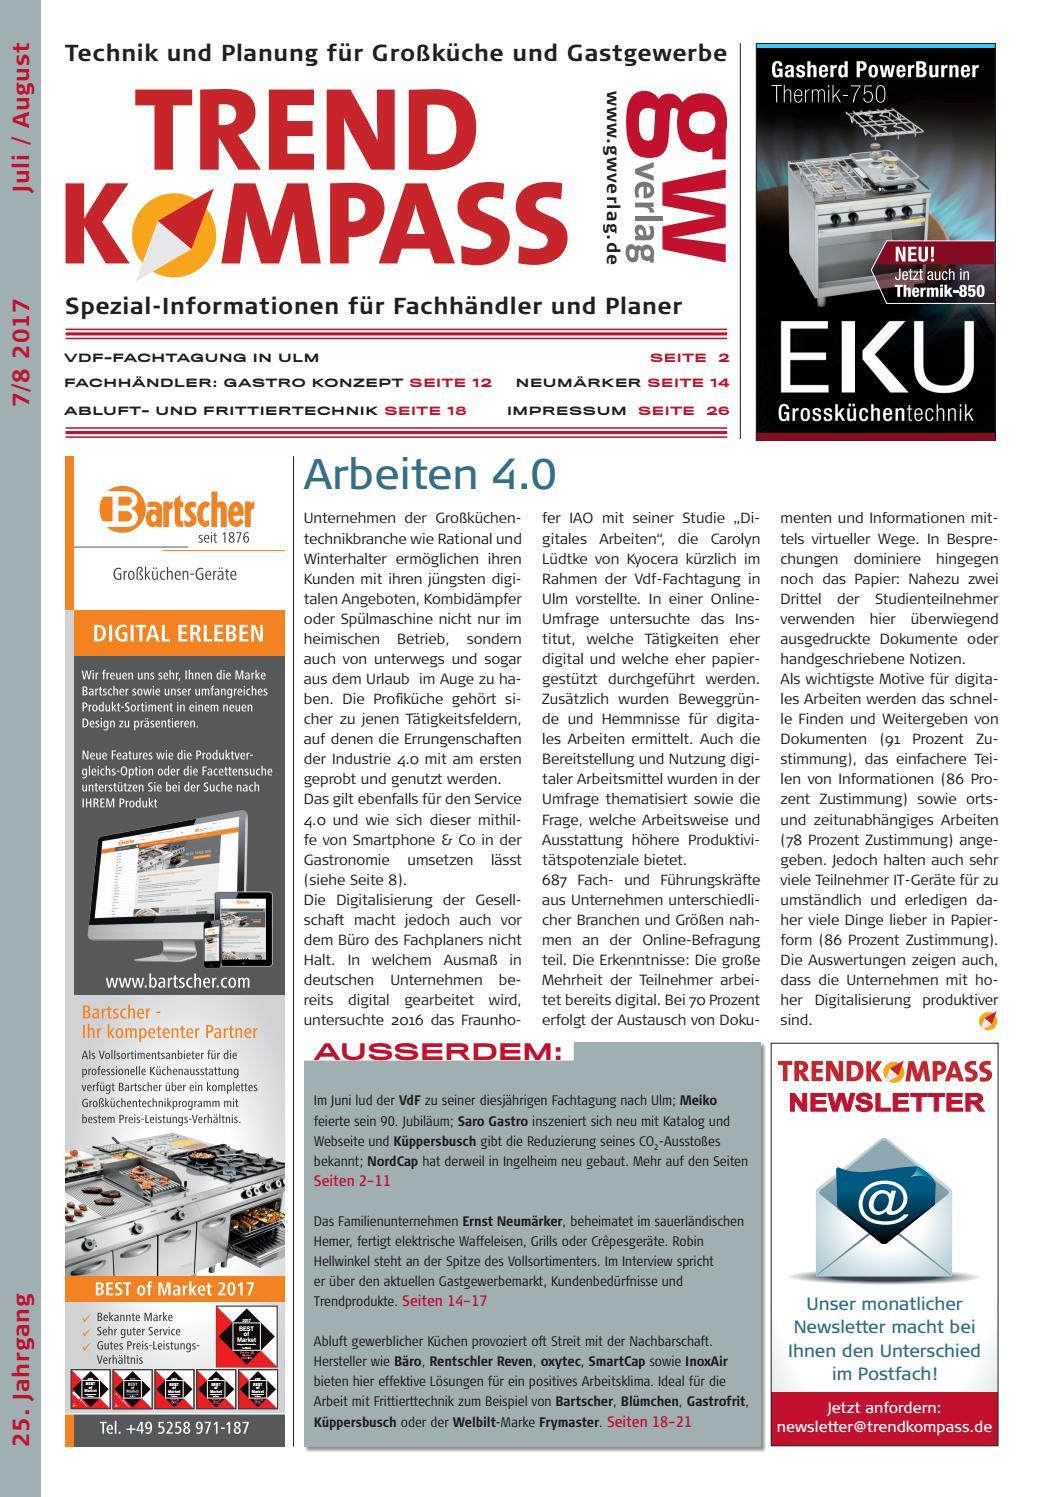 TRENDKOMPASS 7-8/2017 by GW VERLAG - issuu